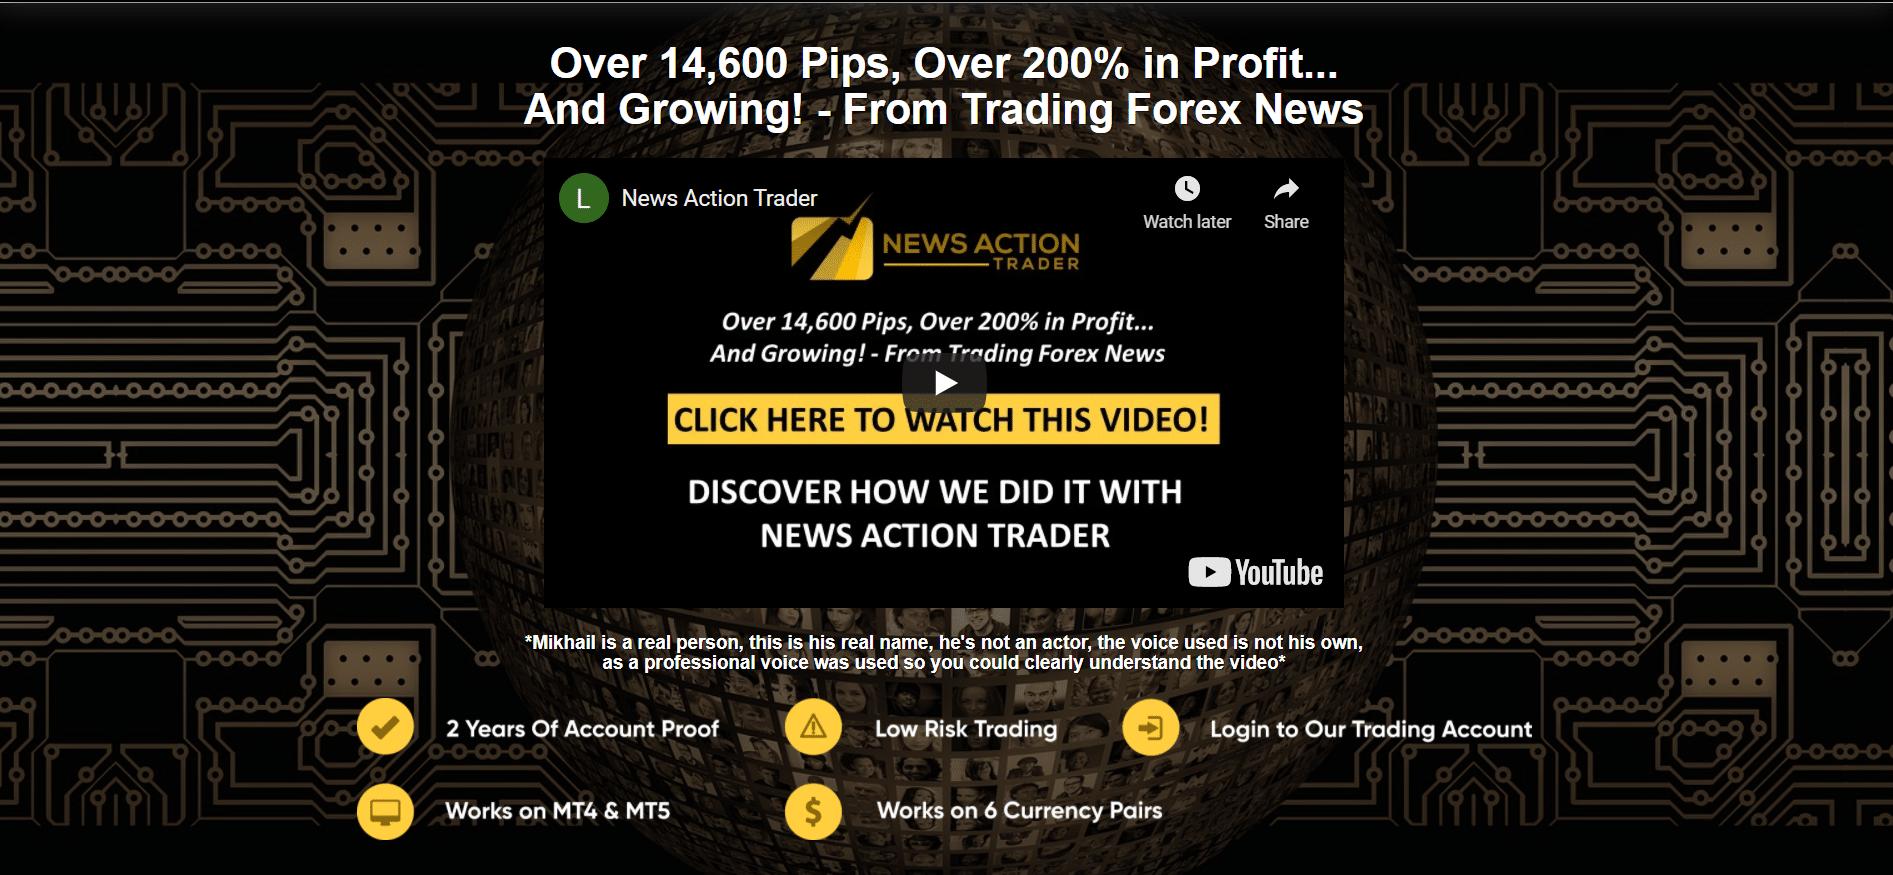 News Action Trader presentation